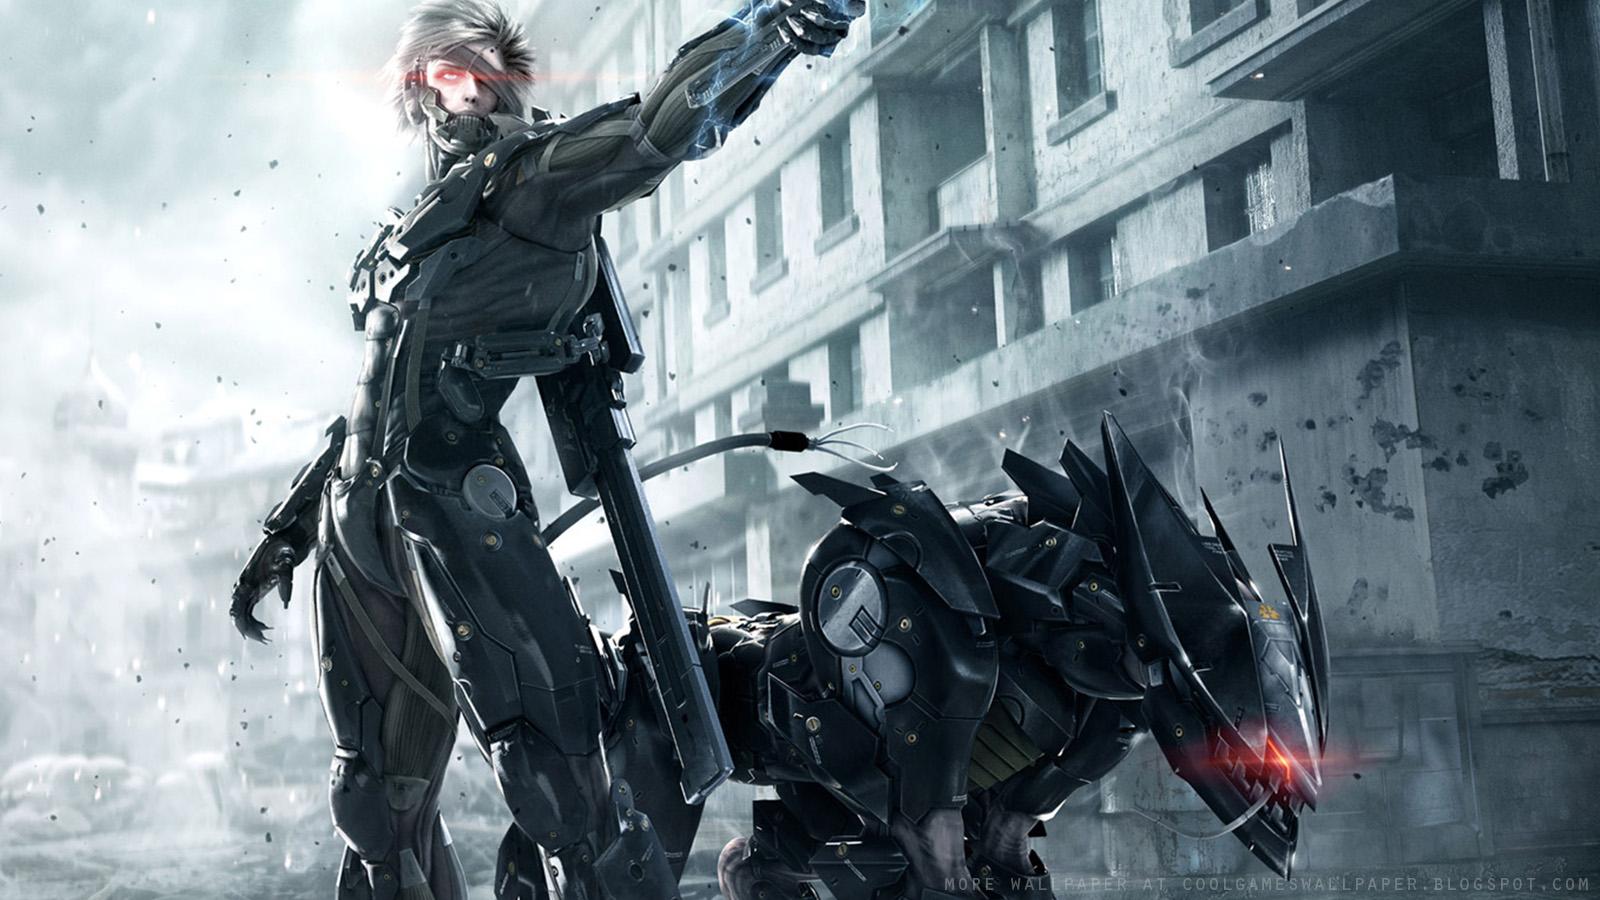 metal gear rising: revengeance wallpapers - cool games wallpaper